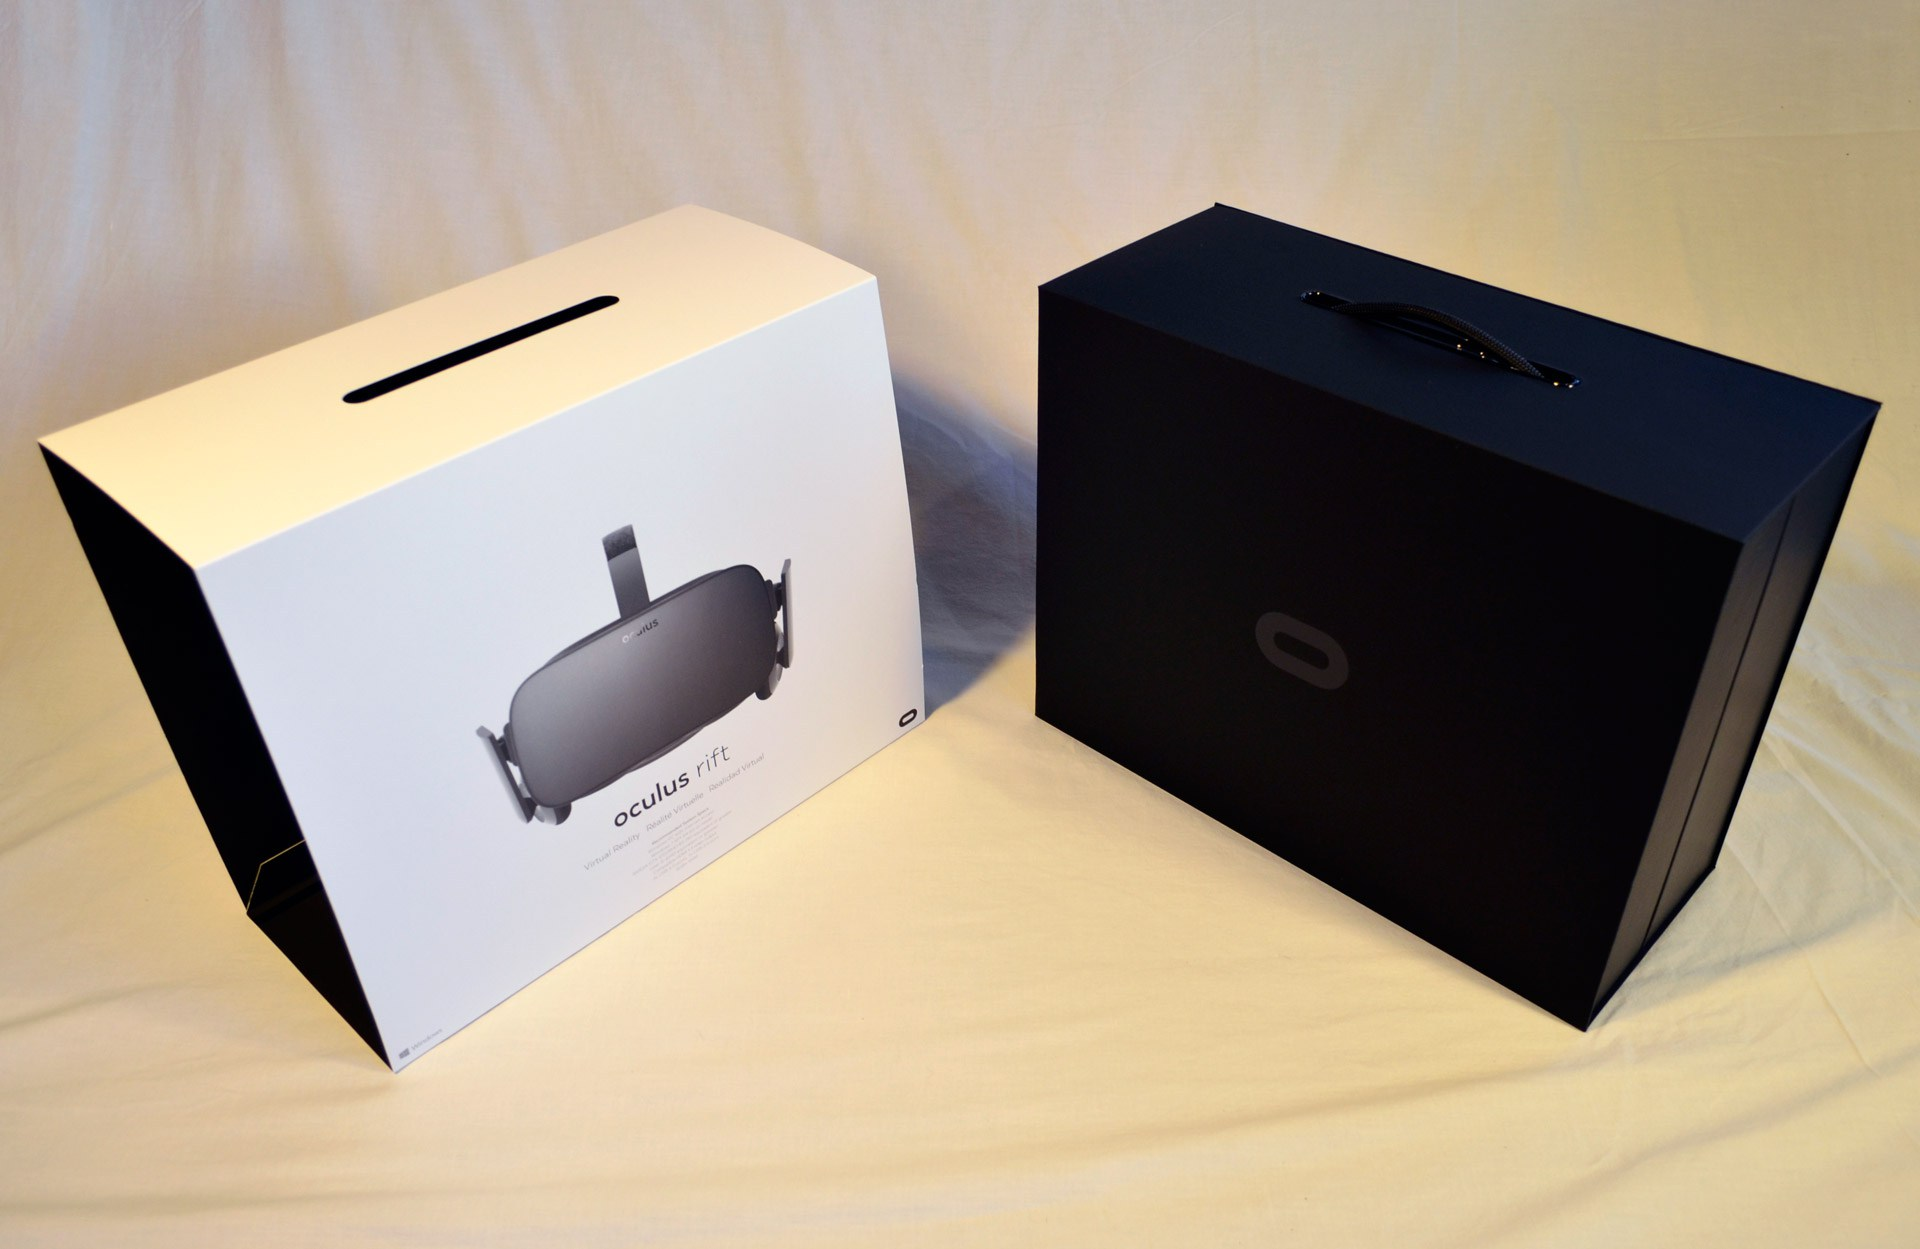 oculus-rift-cv1-unboxing-18.jpg